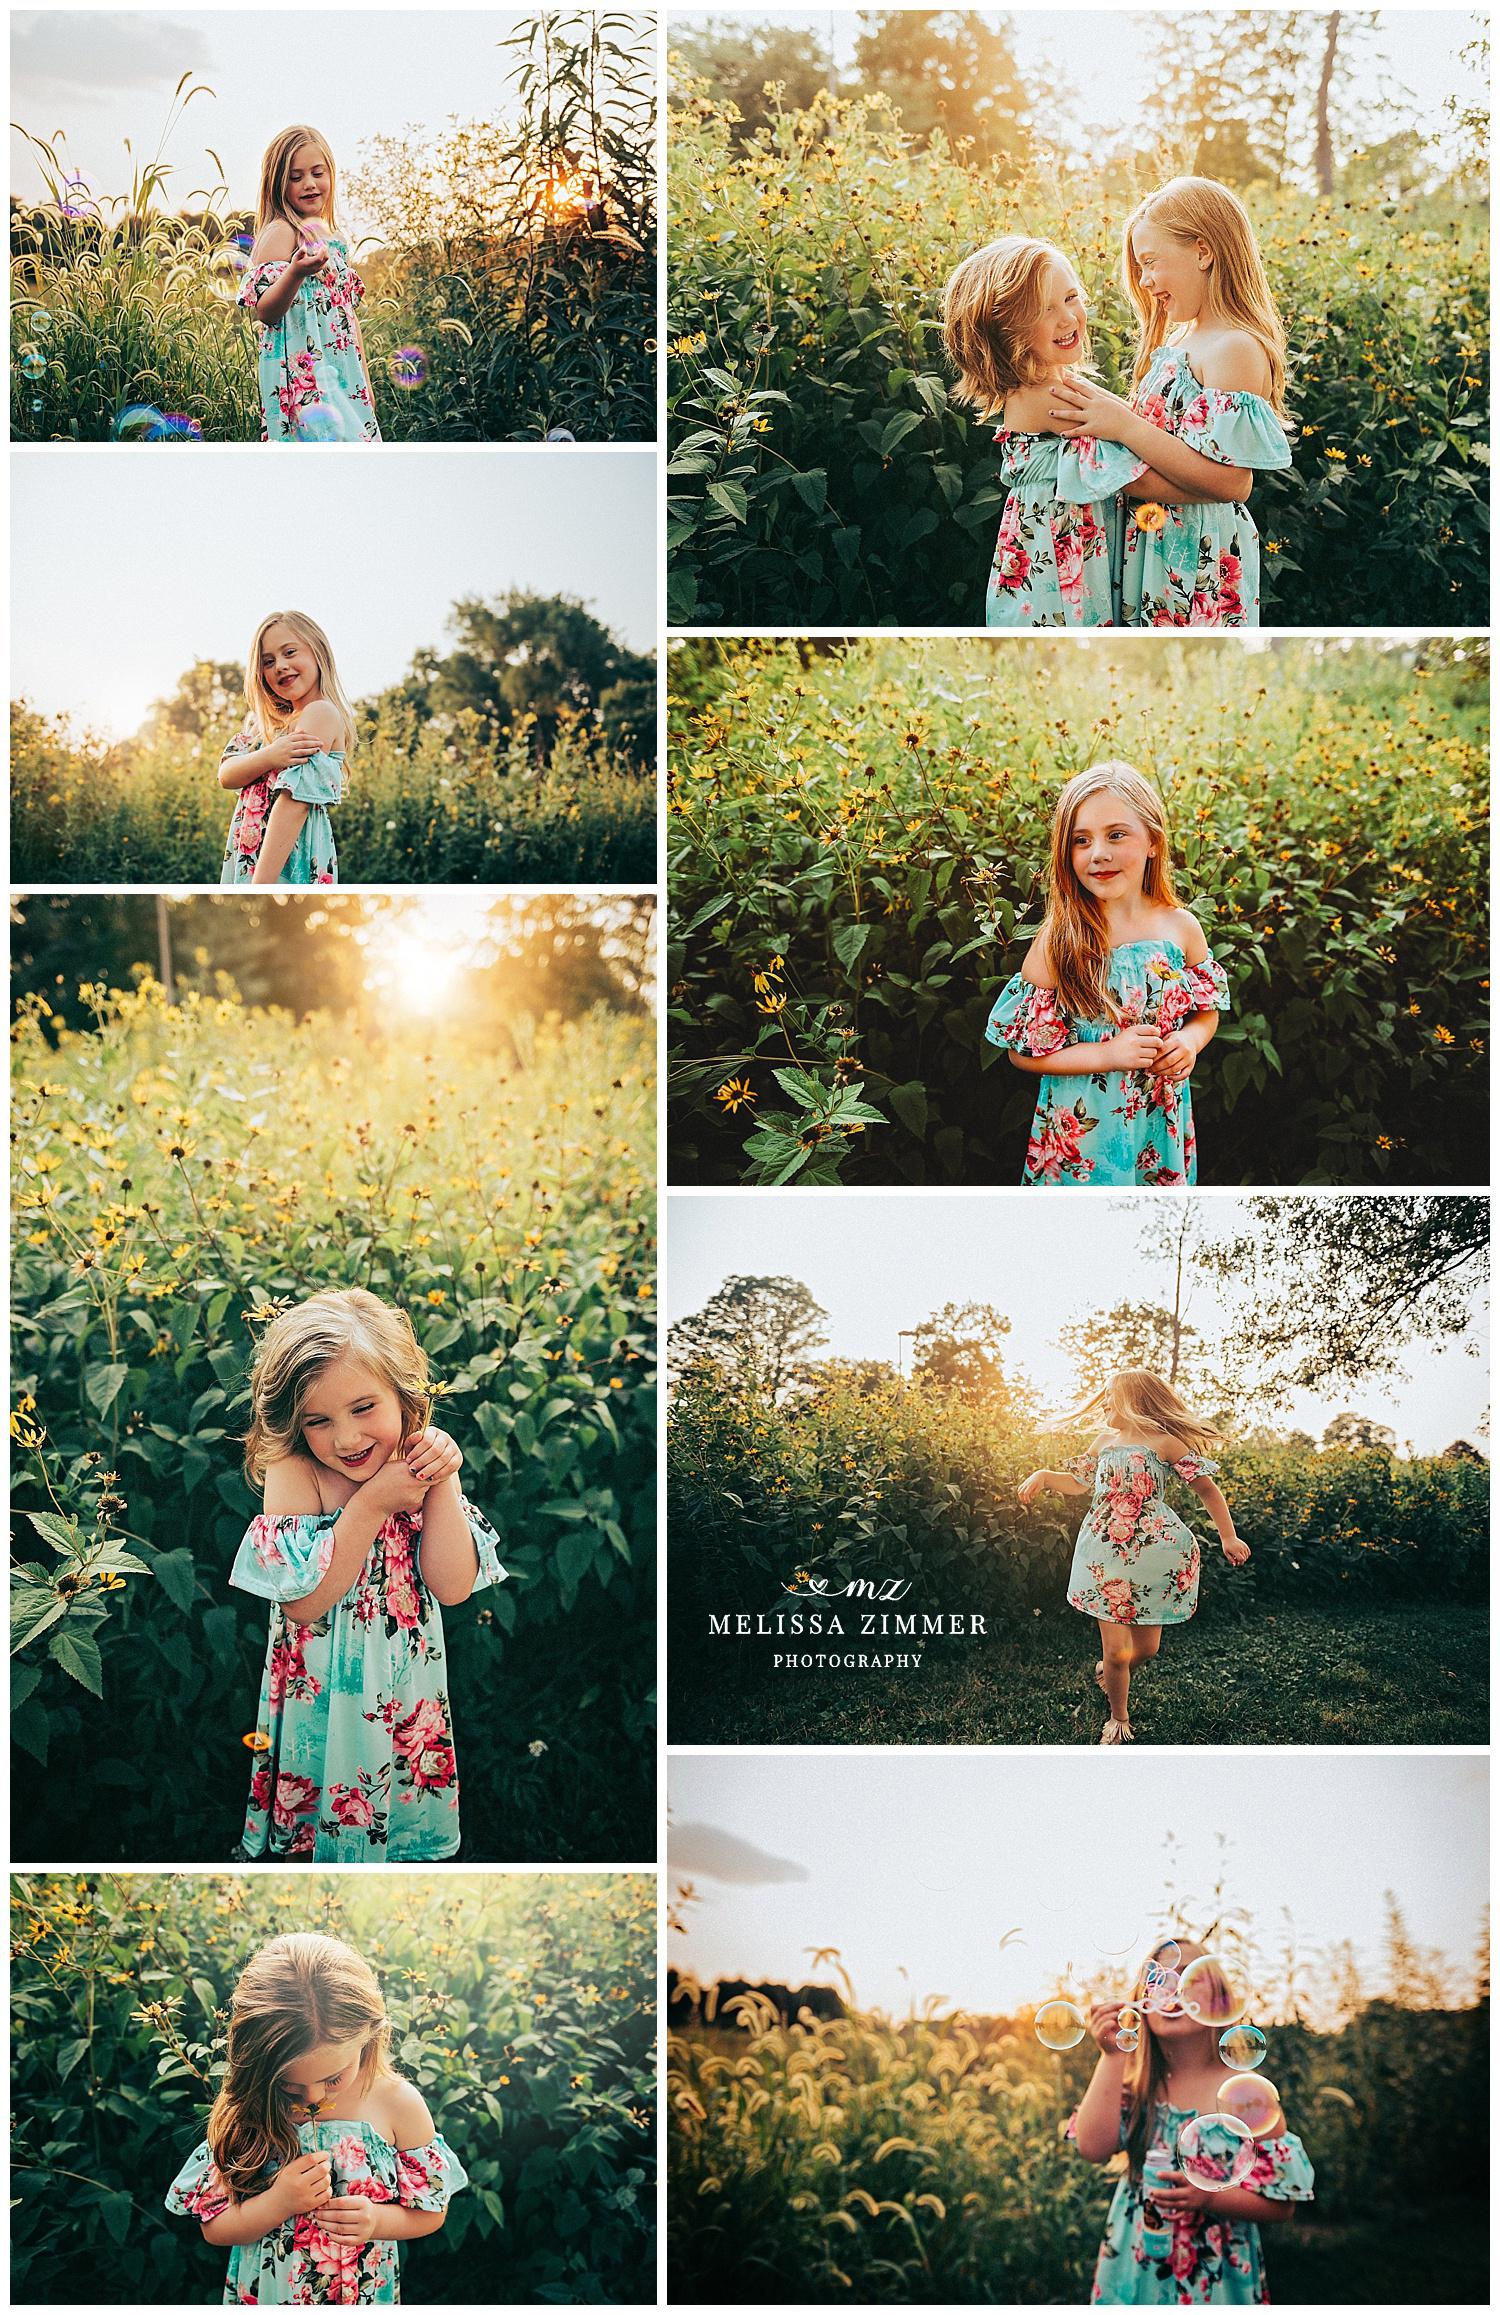 Melissa_Zimmer_Chicago_Photographer.jpg